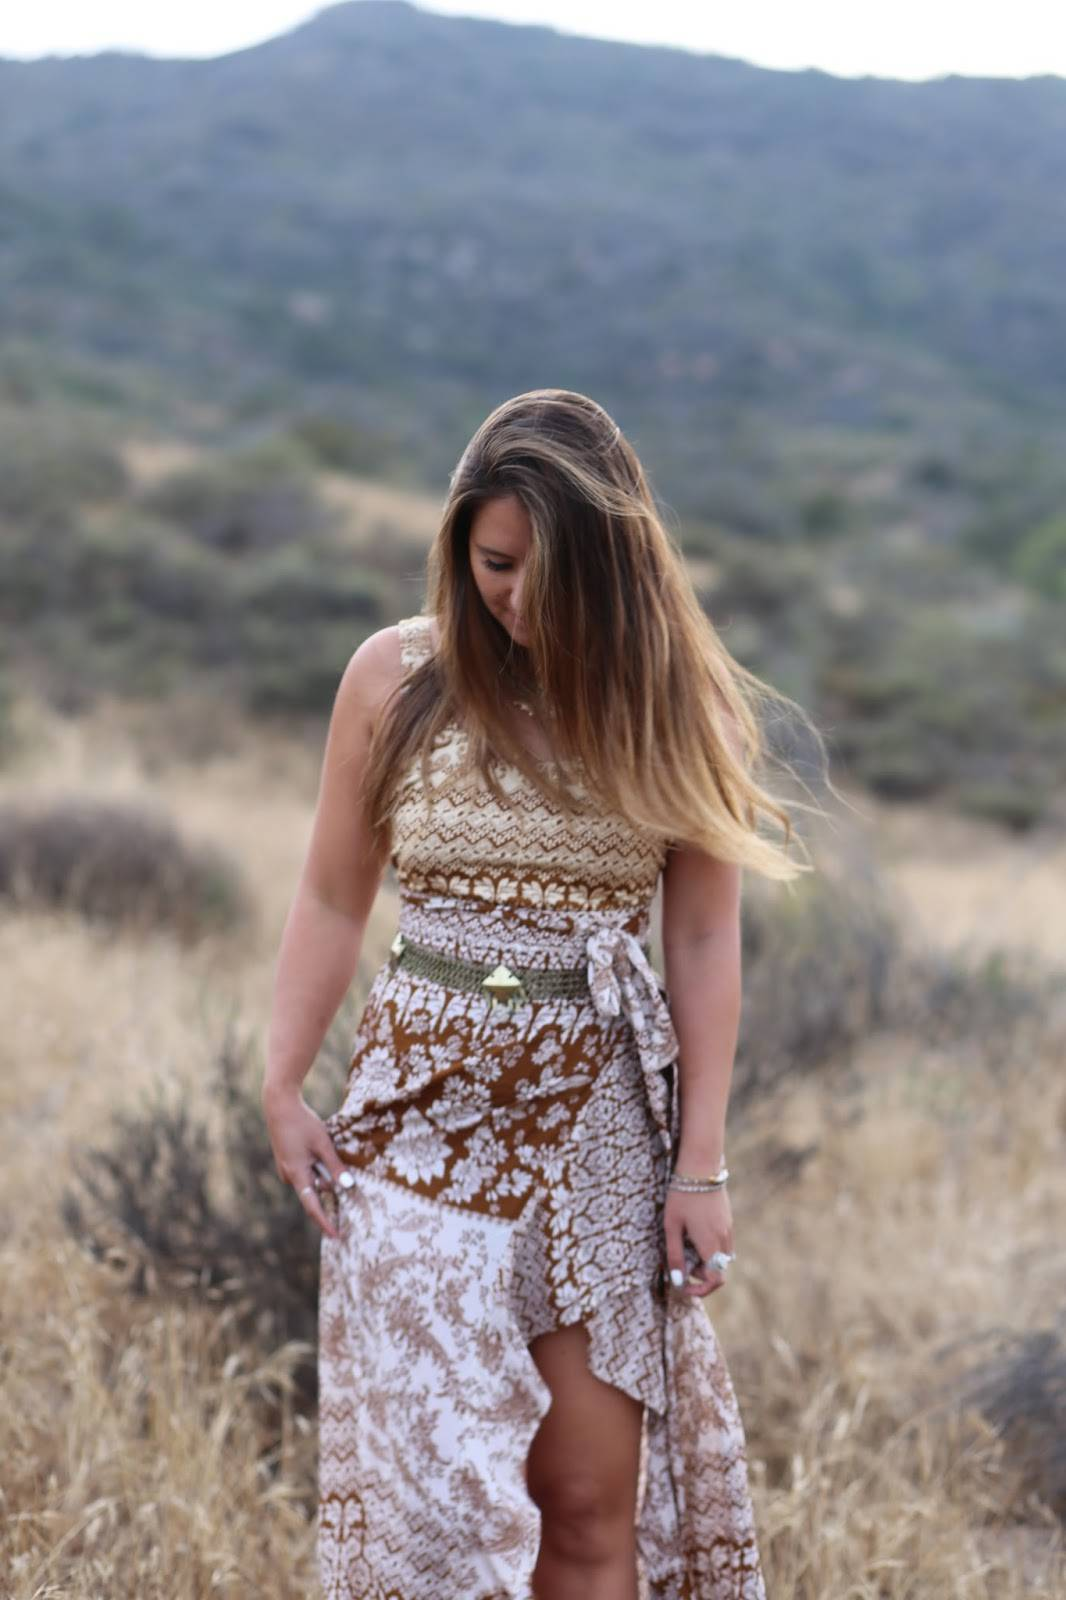 boho-nouveau-california-outfit